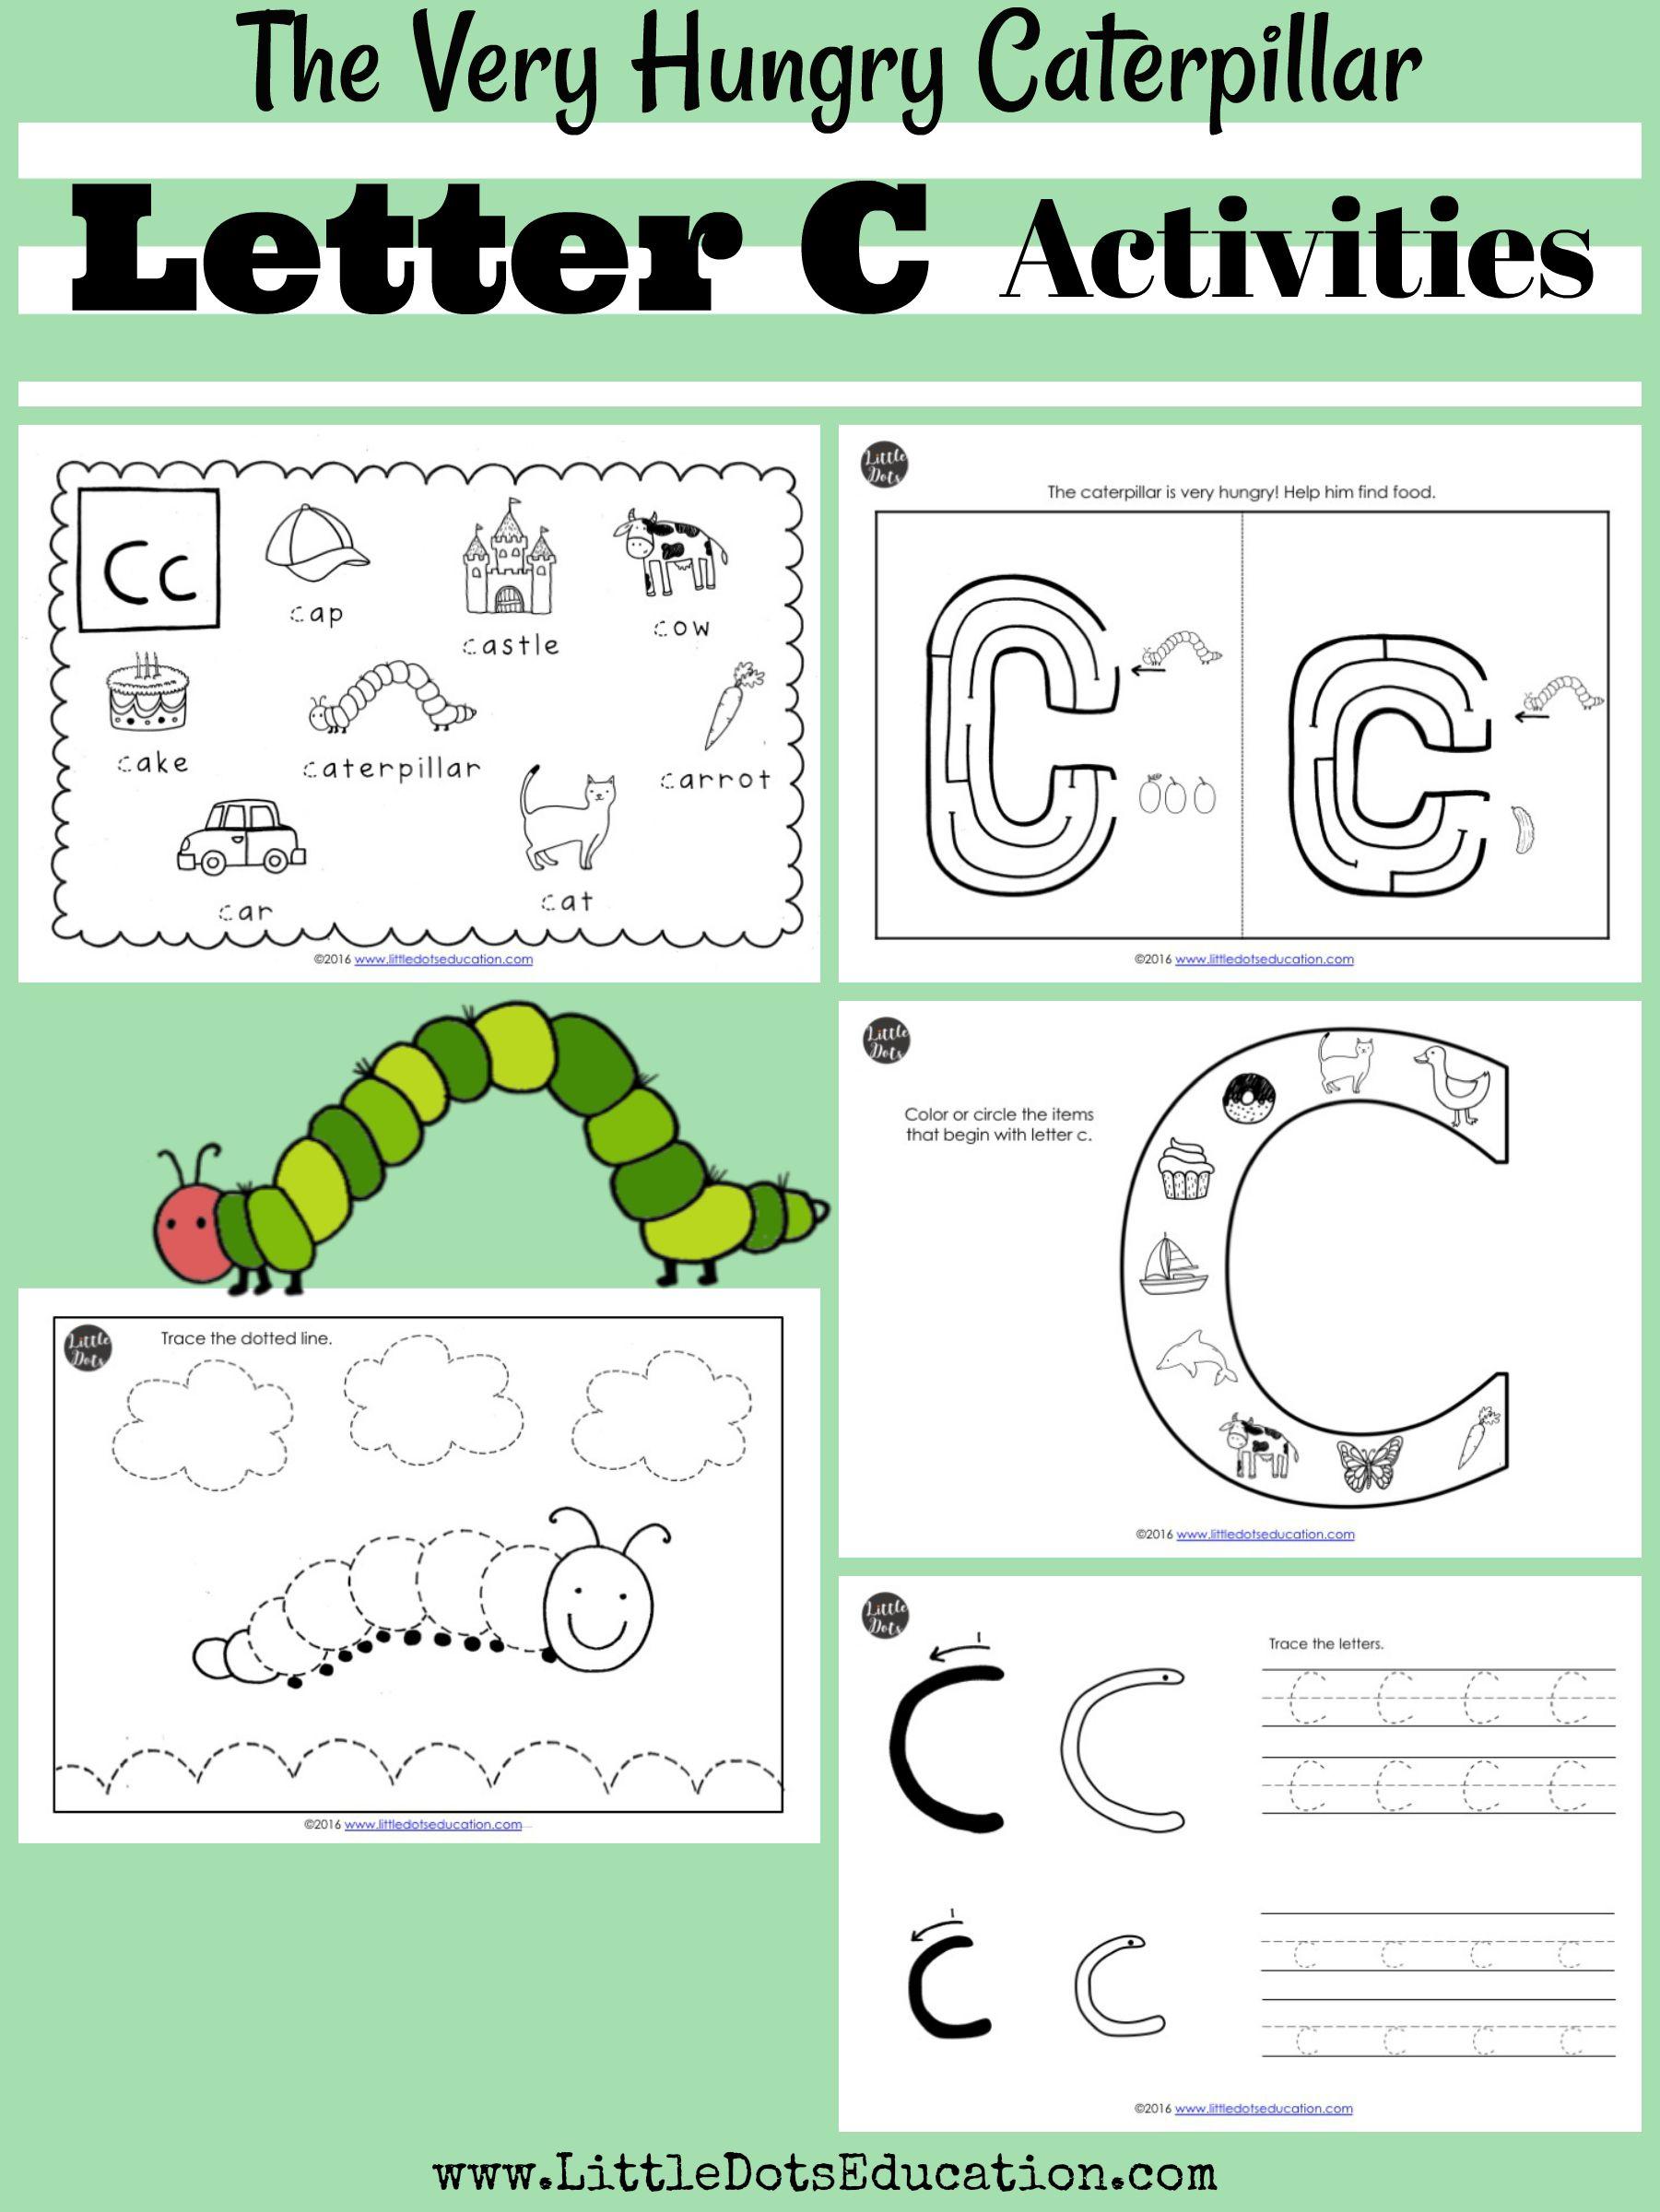 Download Letter C Activities And Worksheets For Preschool